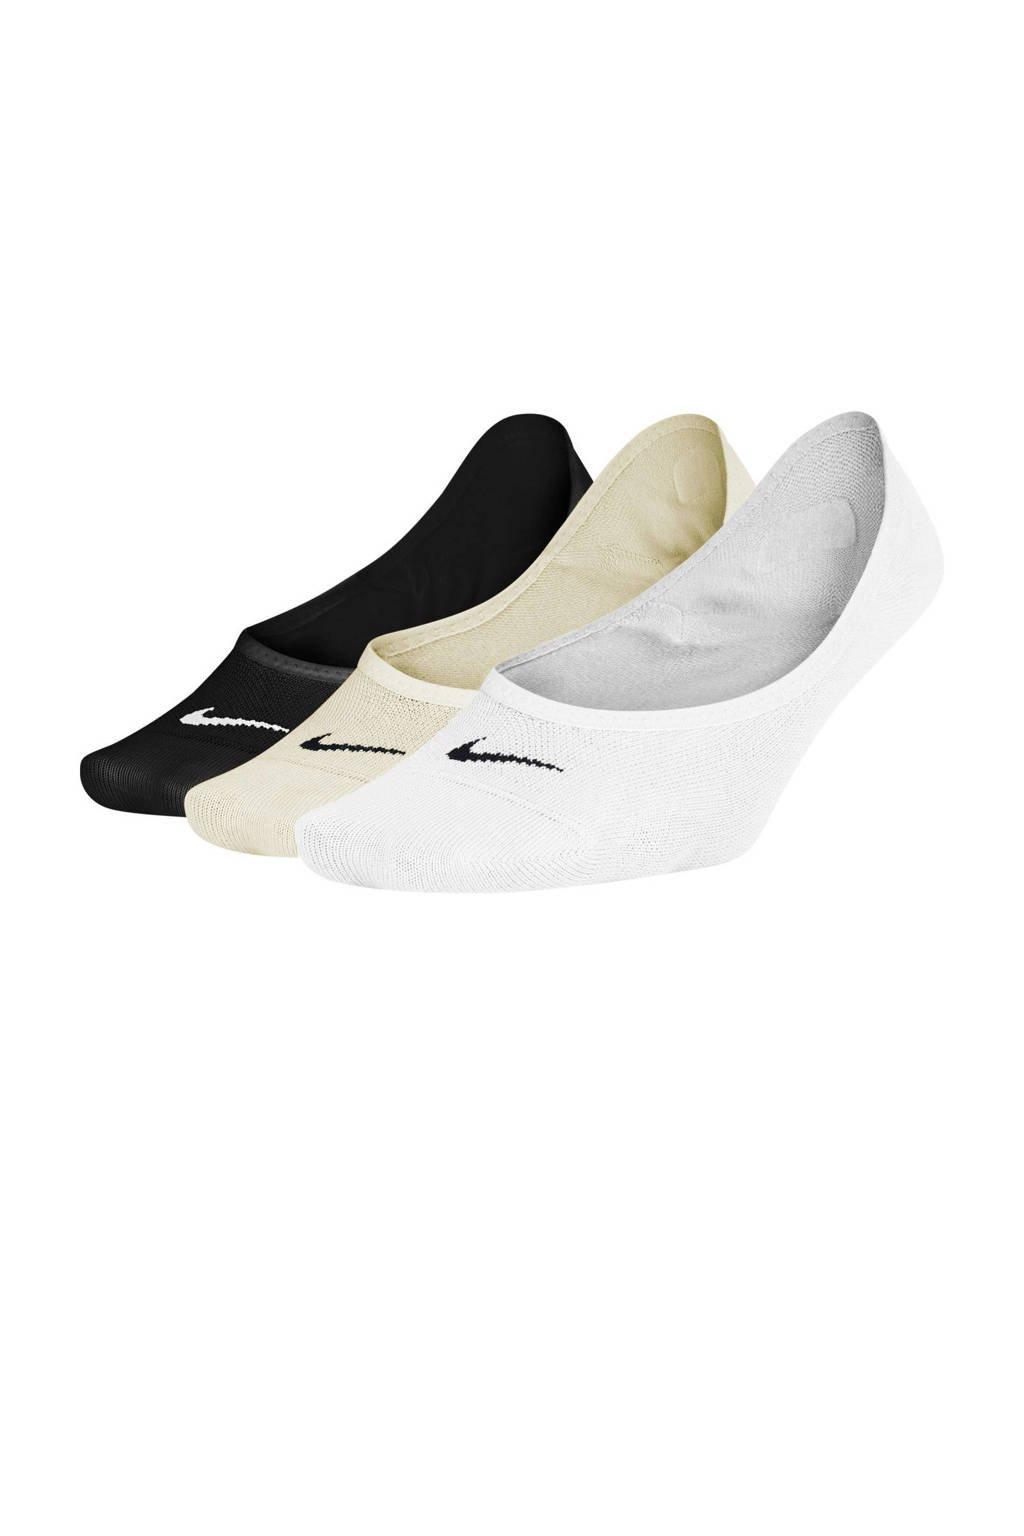 Nike sportsokken Everyday Lightweight zwart/beige/wit, zwart/ beige/wit